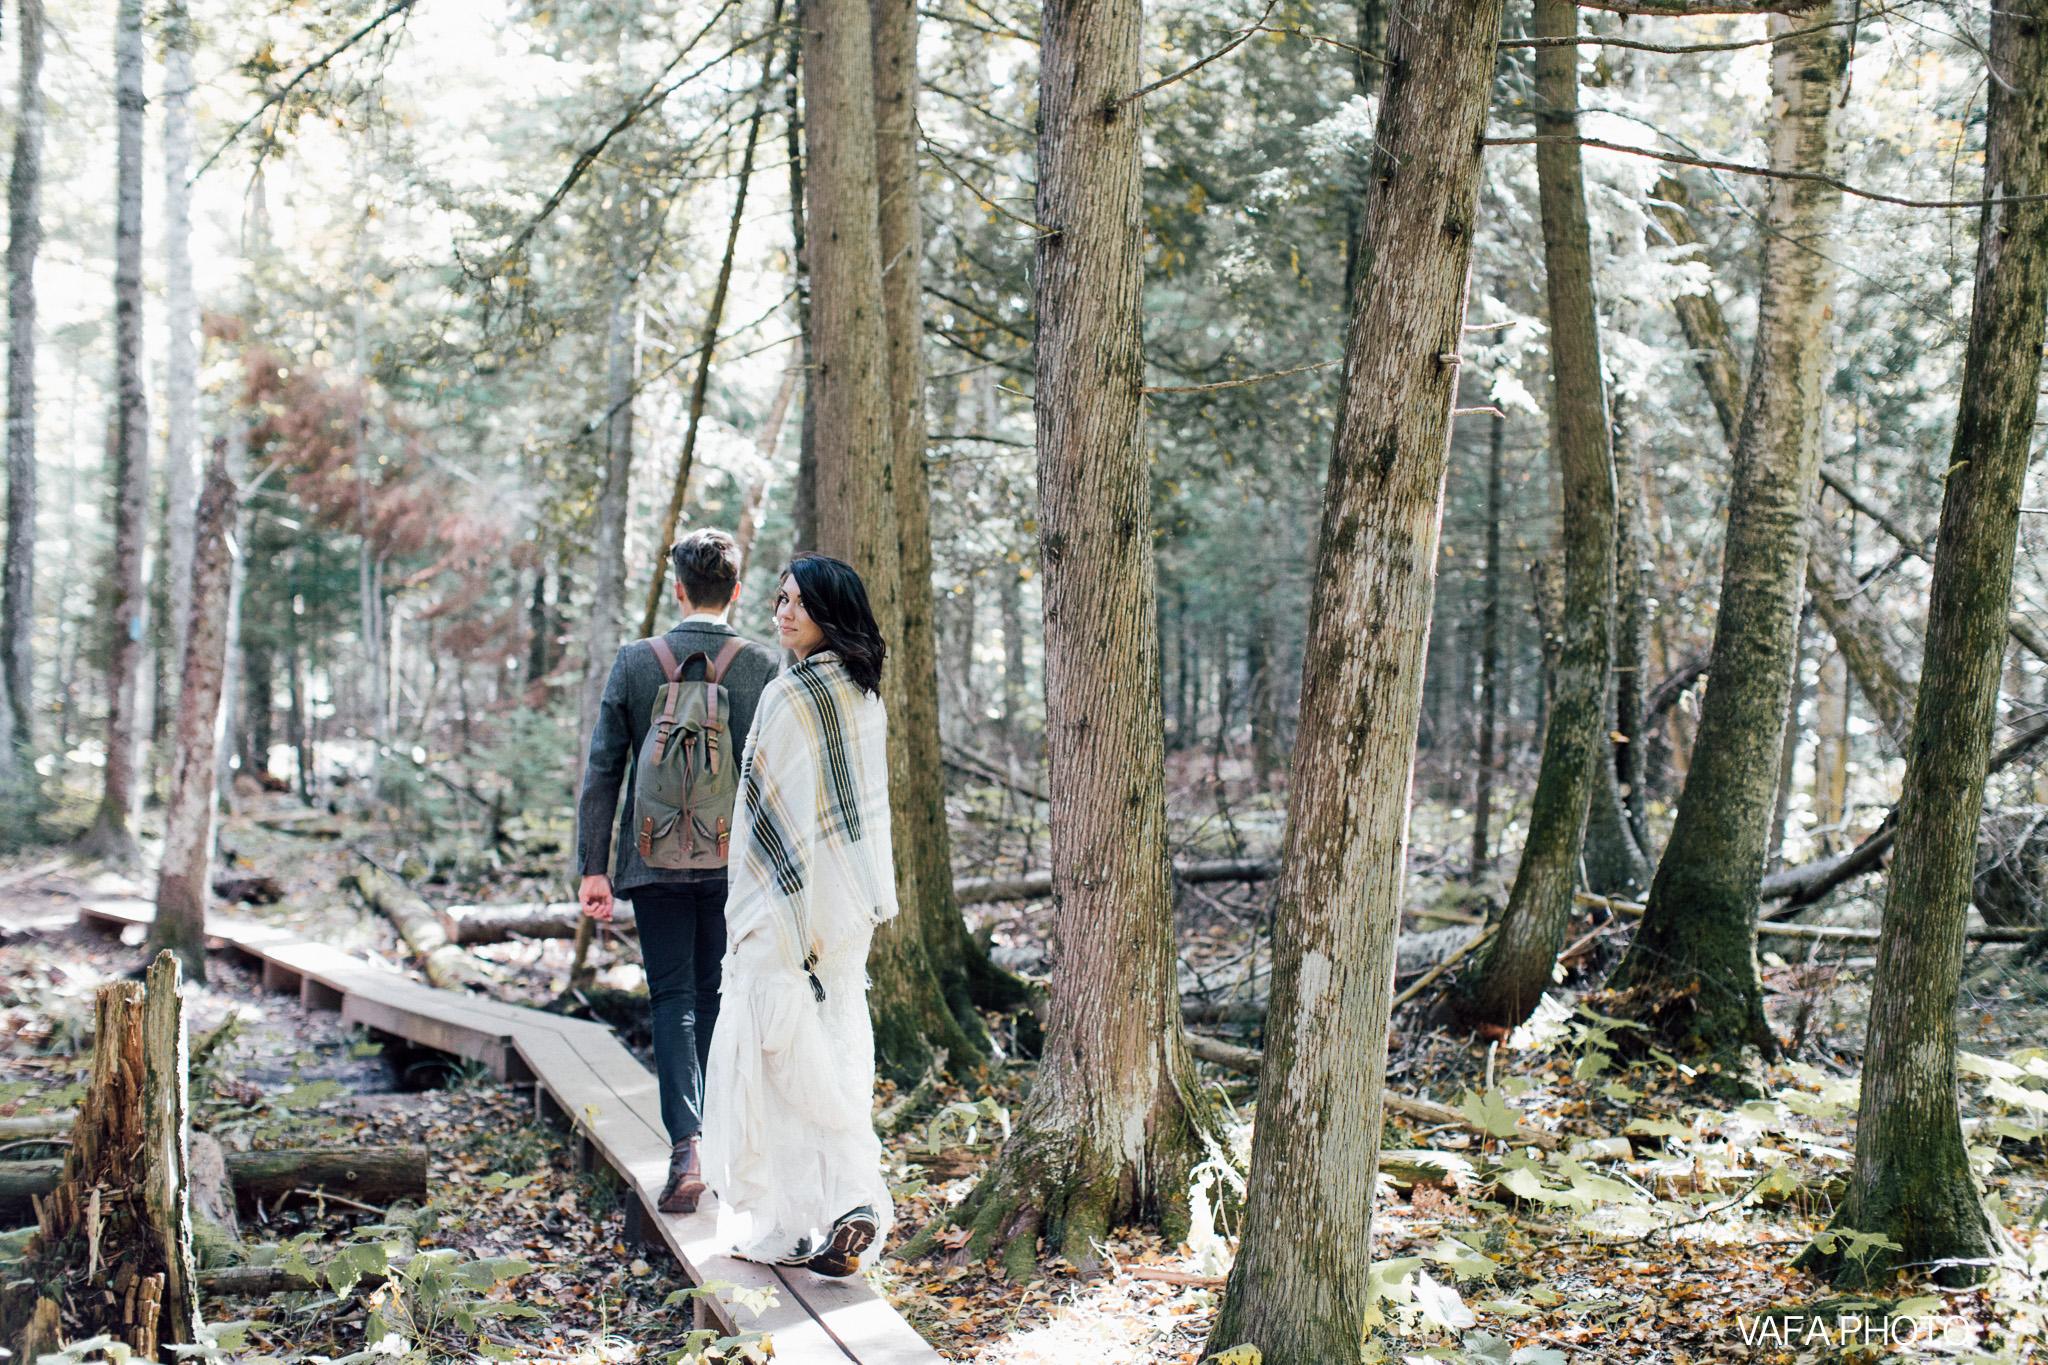 Hogback-Mountain-Wedding-Chelsea-Josh-Vafa-Photo-508.jpg